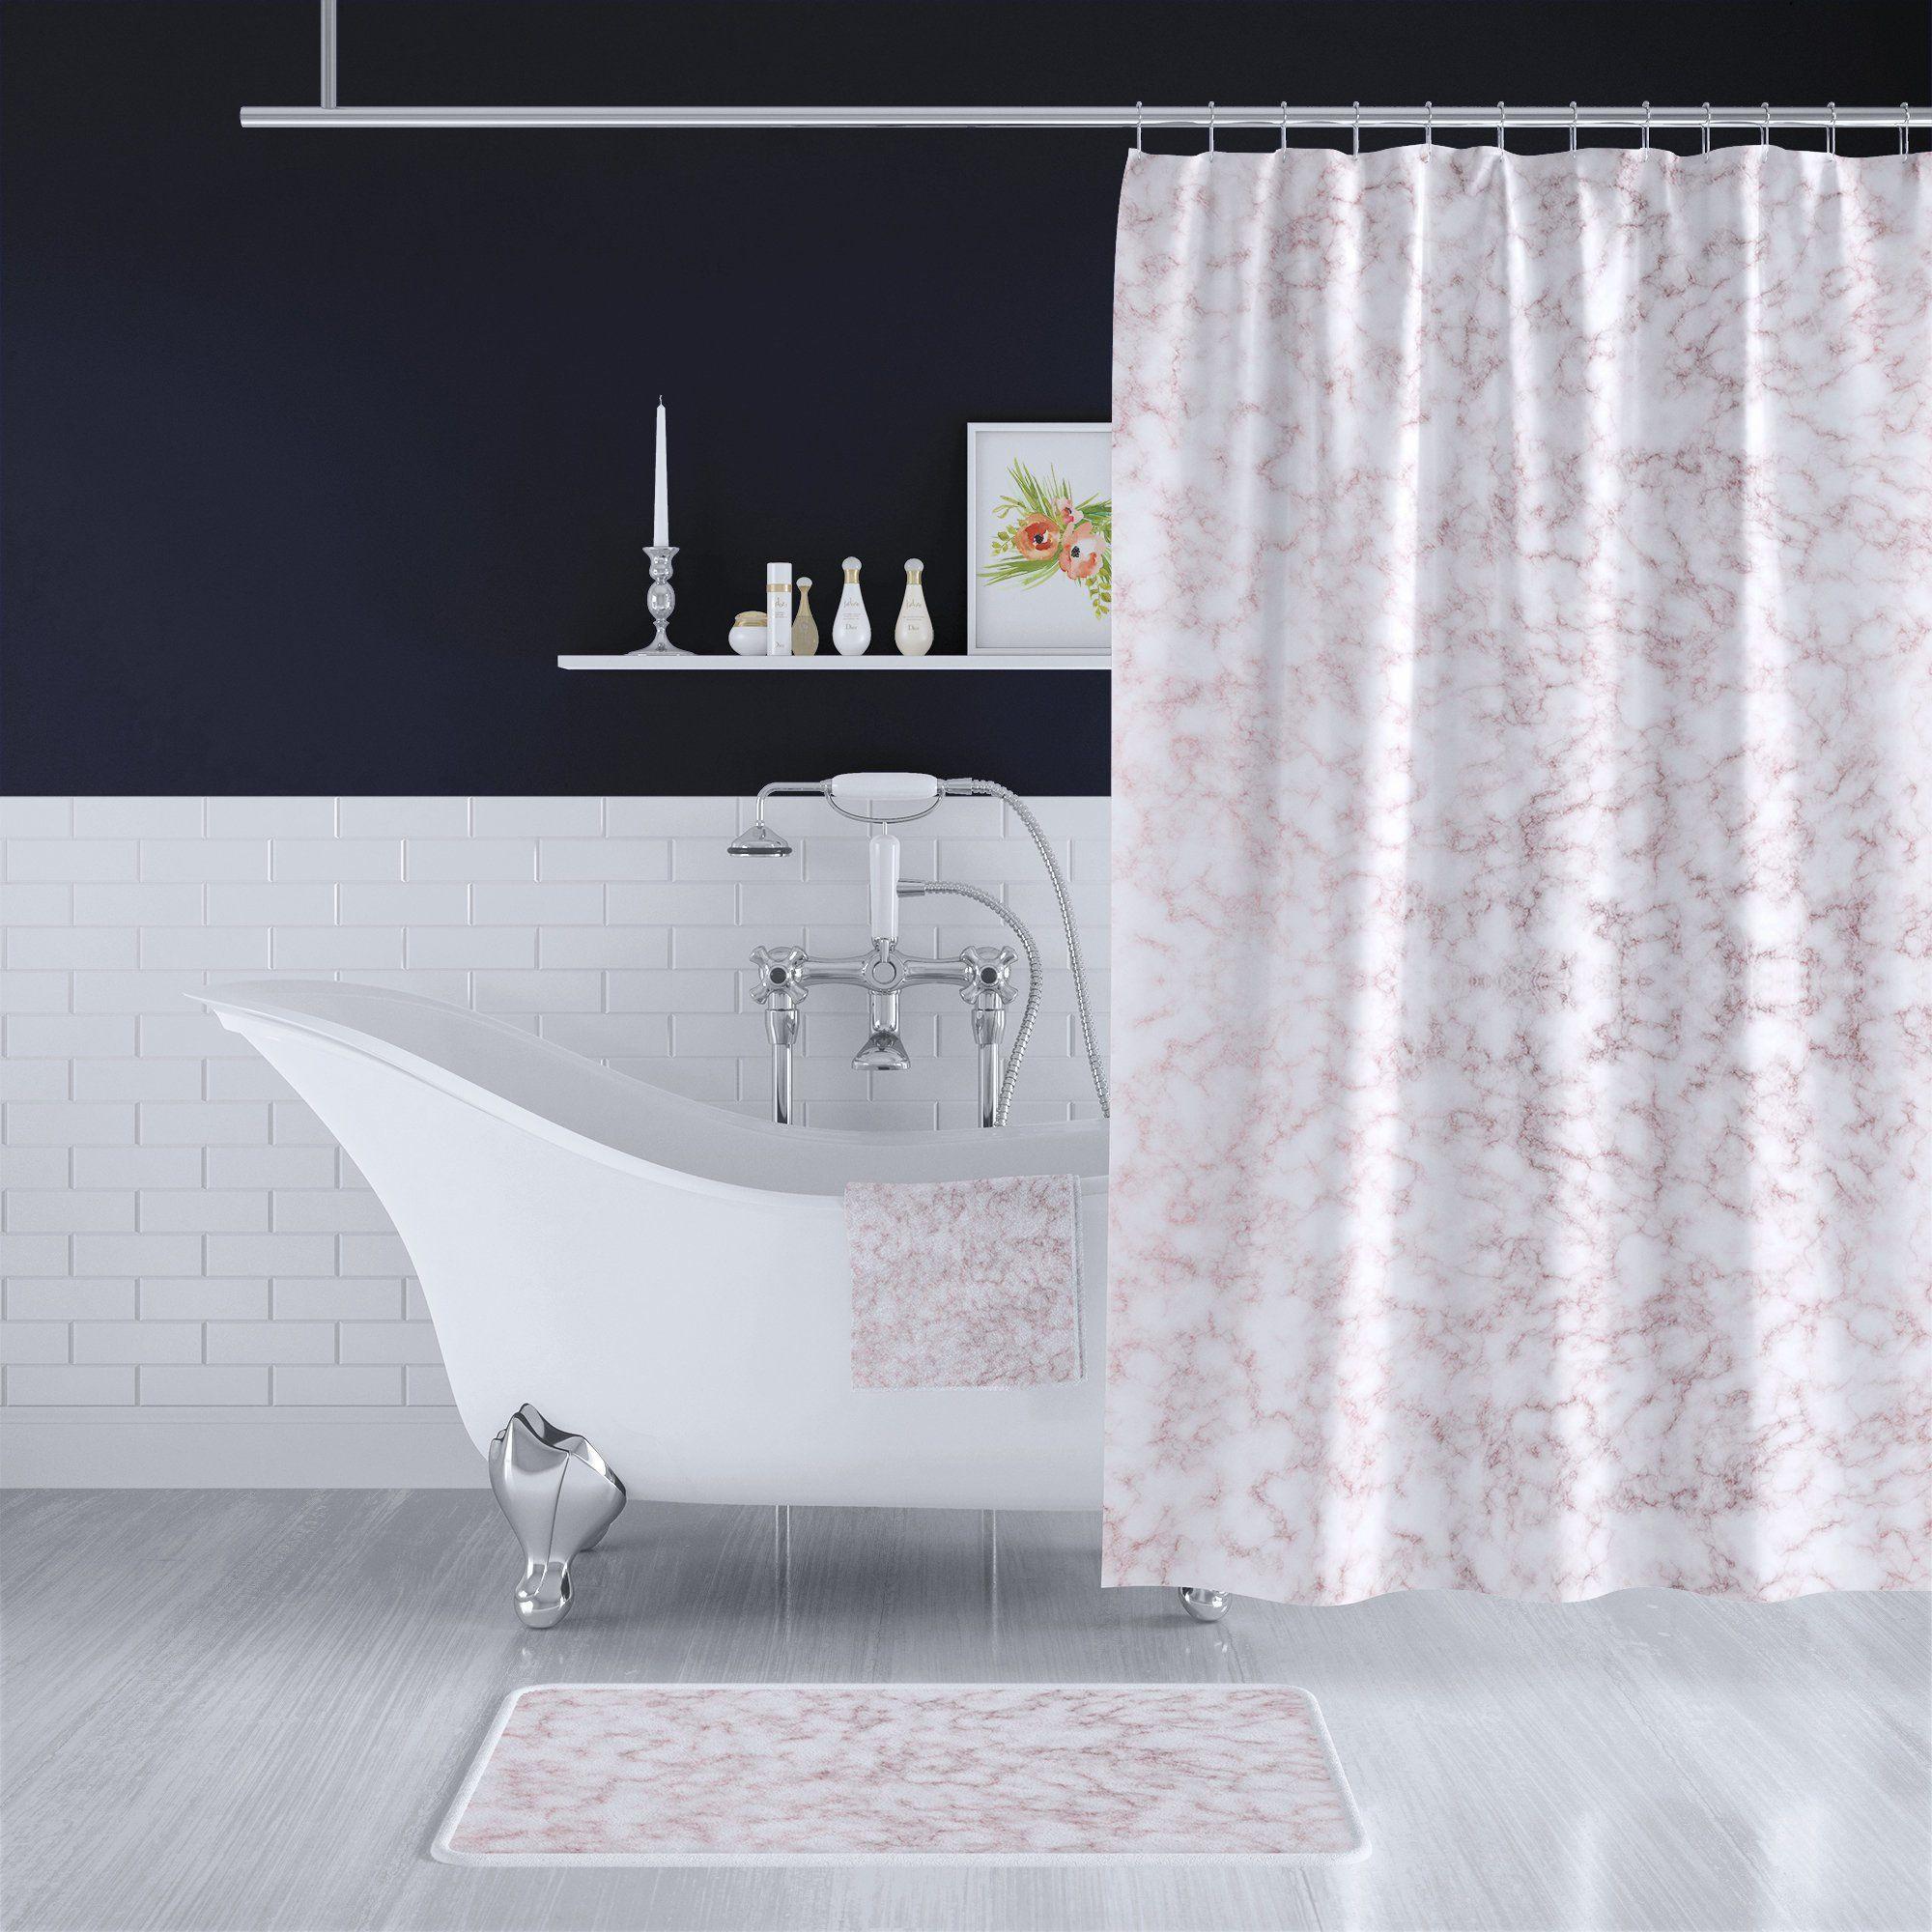 Rose Gold White Marble Bathroom Decor Set Long Shower Curtain Bath Towel Bath Mat Matching Complete Set White Marble Bathrooms Bathroom Decor Sets Long Shower Curtains